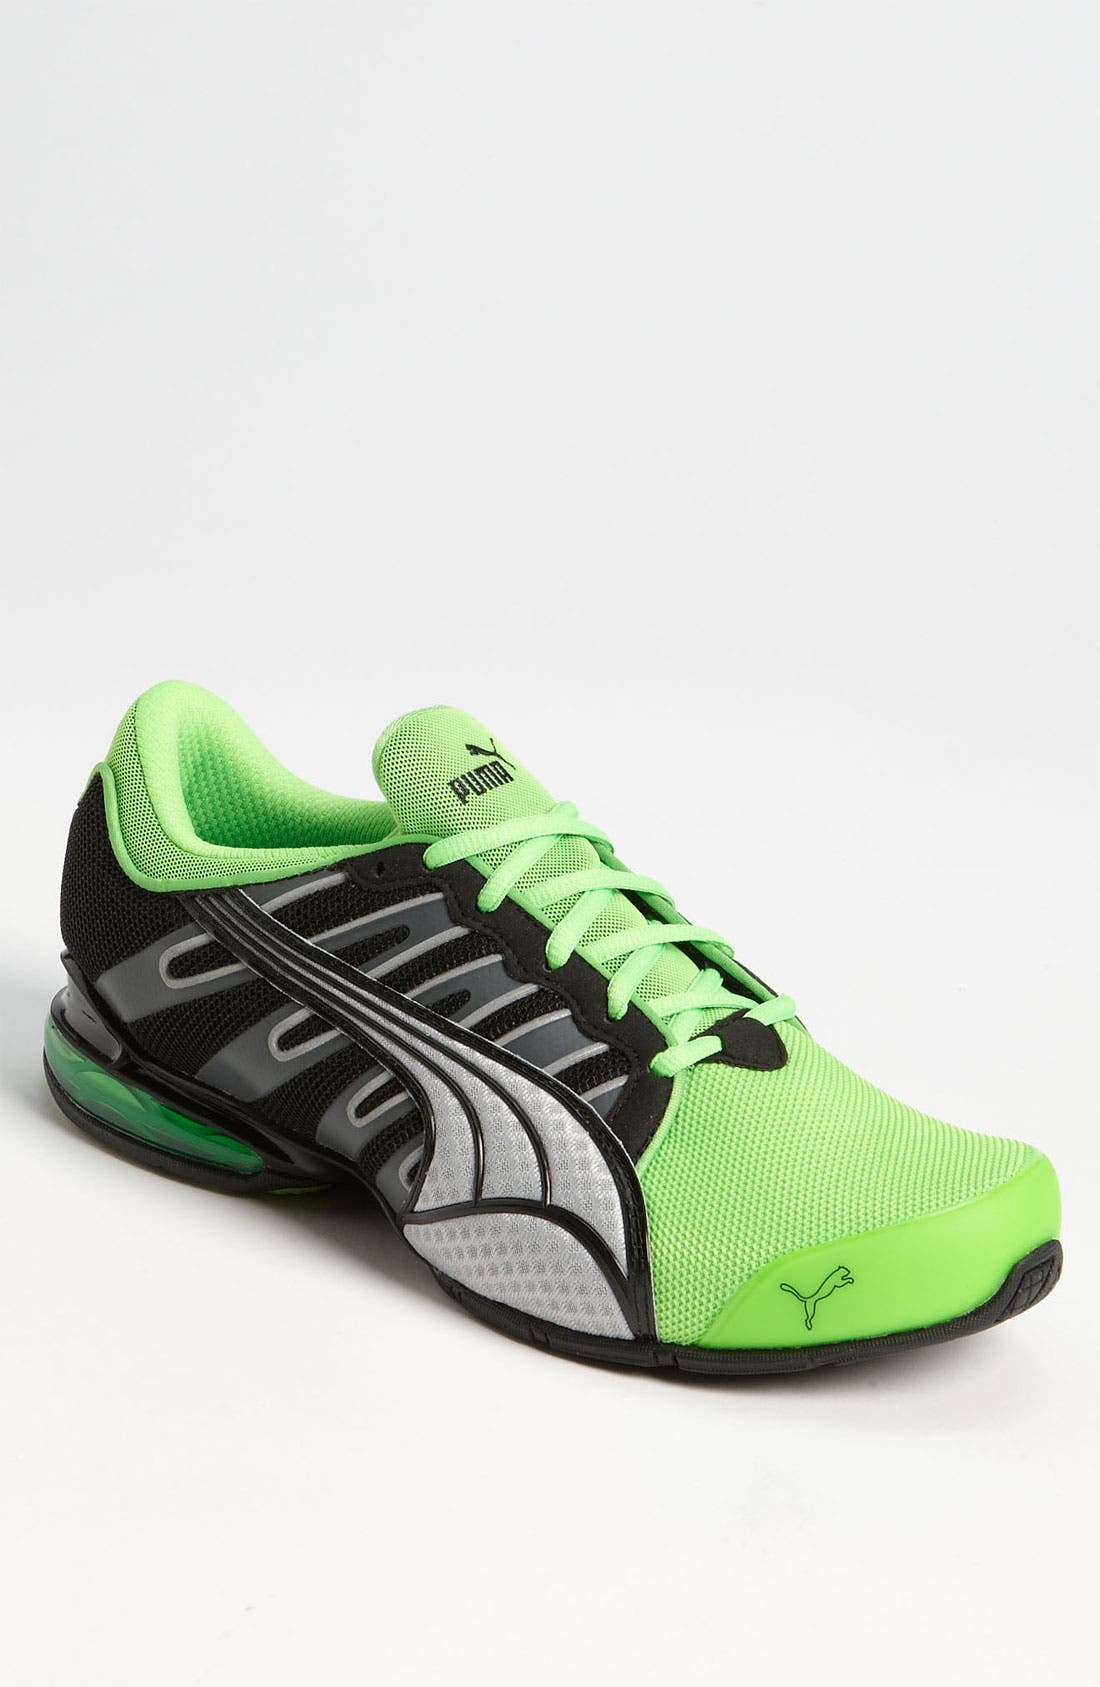 Alternate Image 1 Selected - PUMA 'Voltaic 3 NM' Running Shoe (Men)